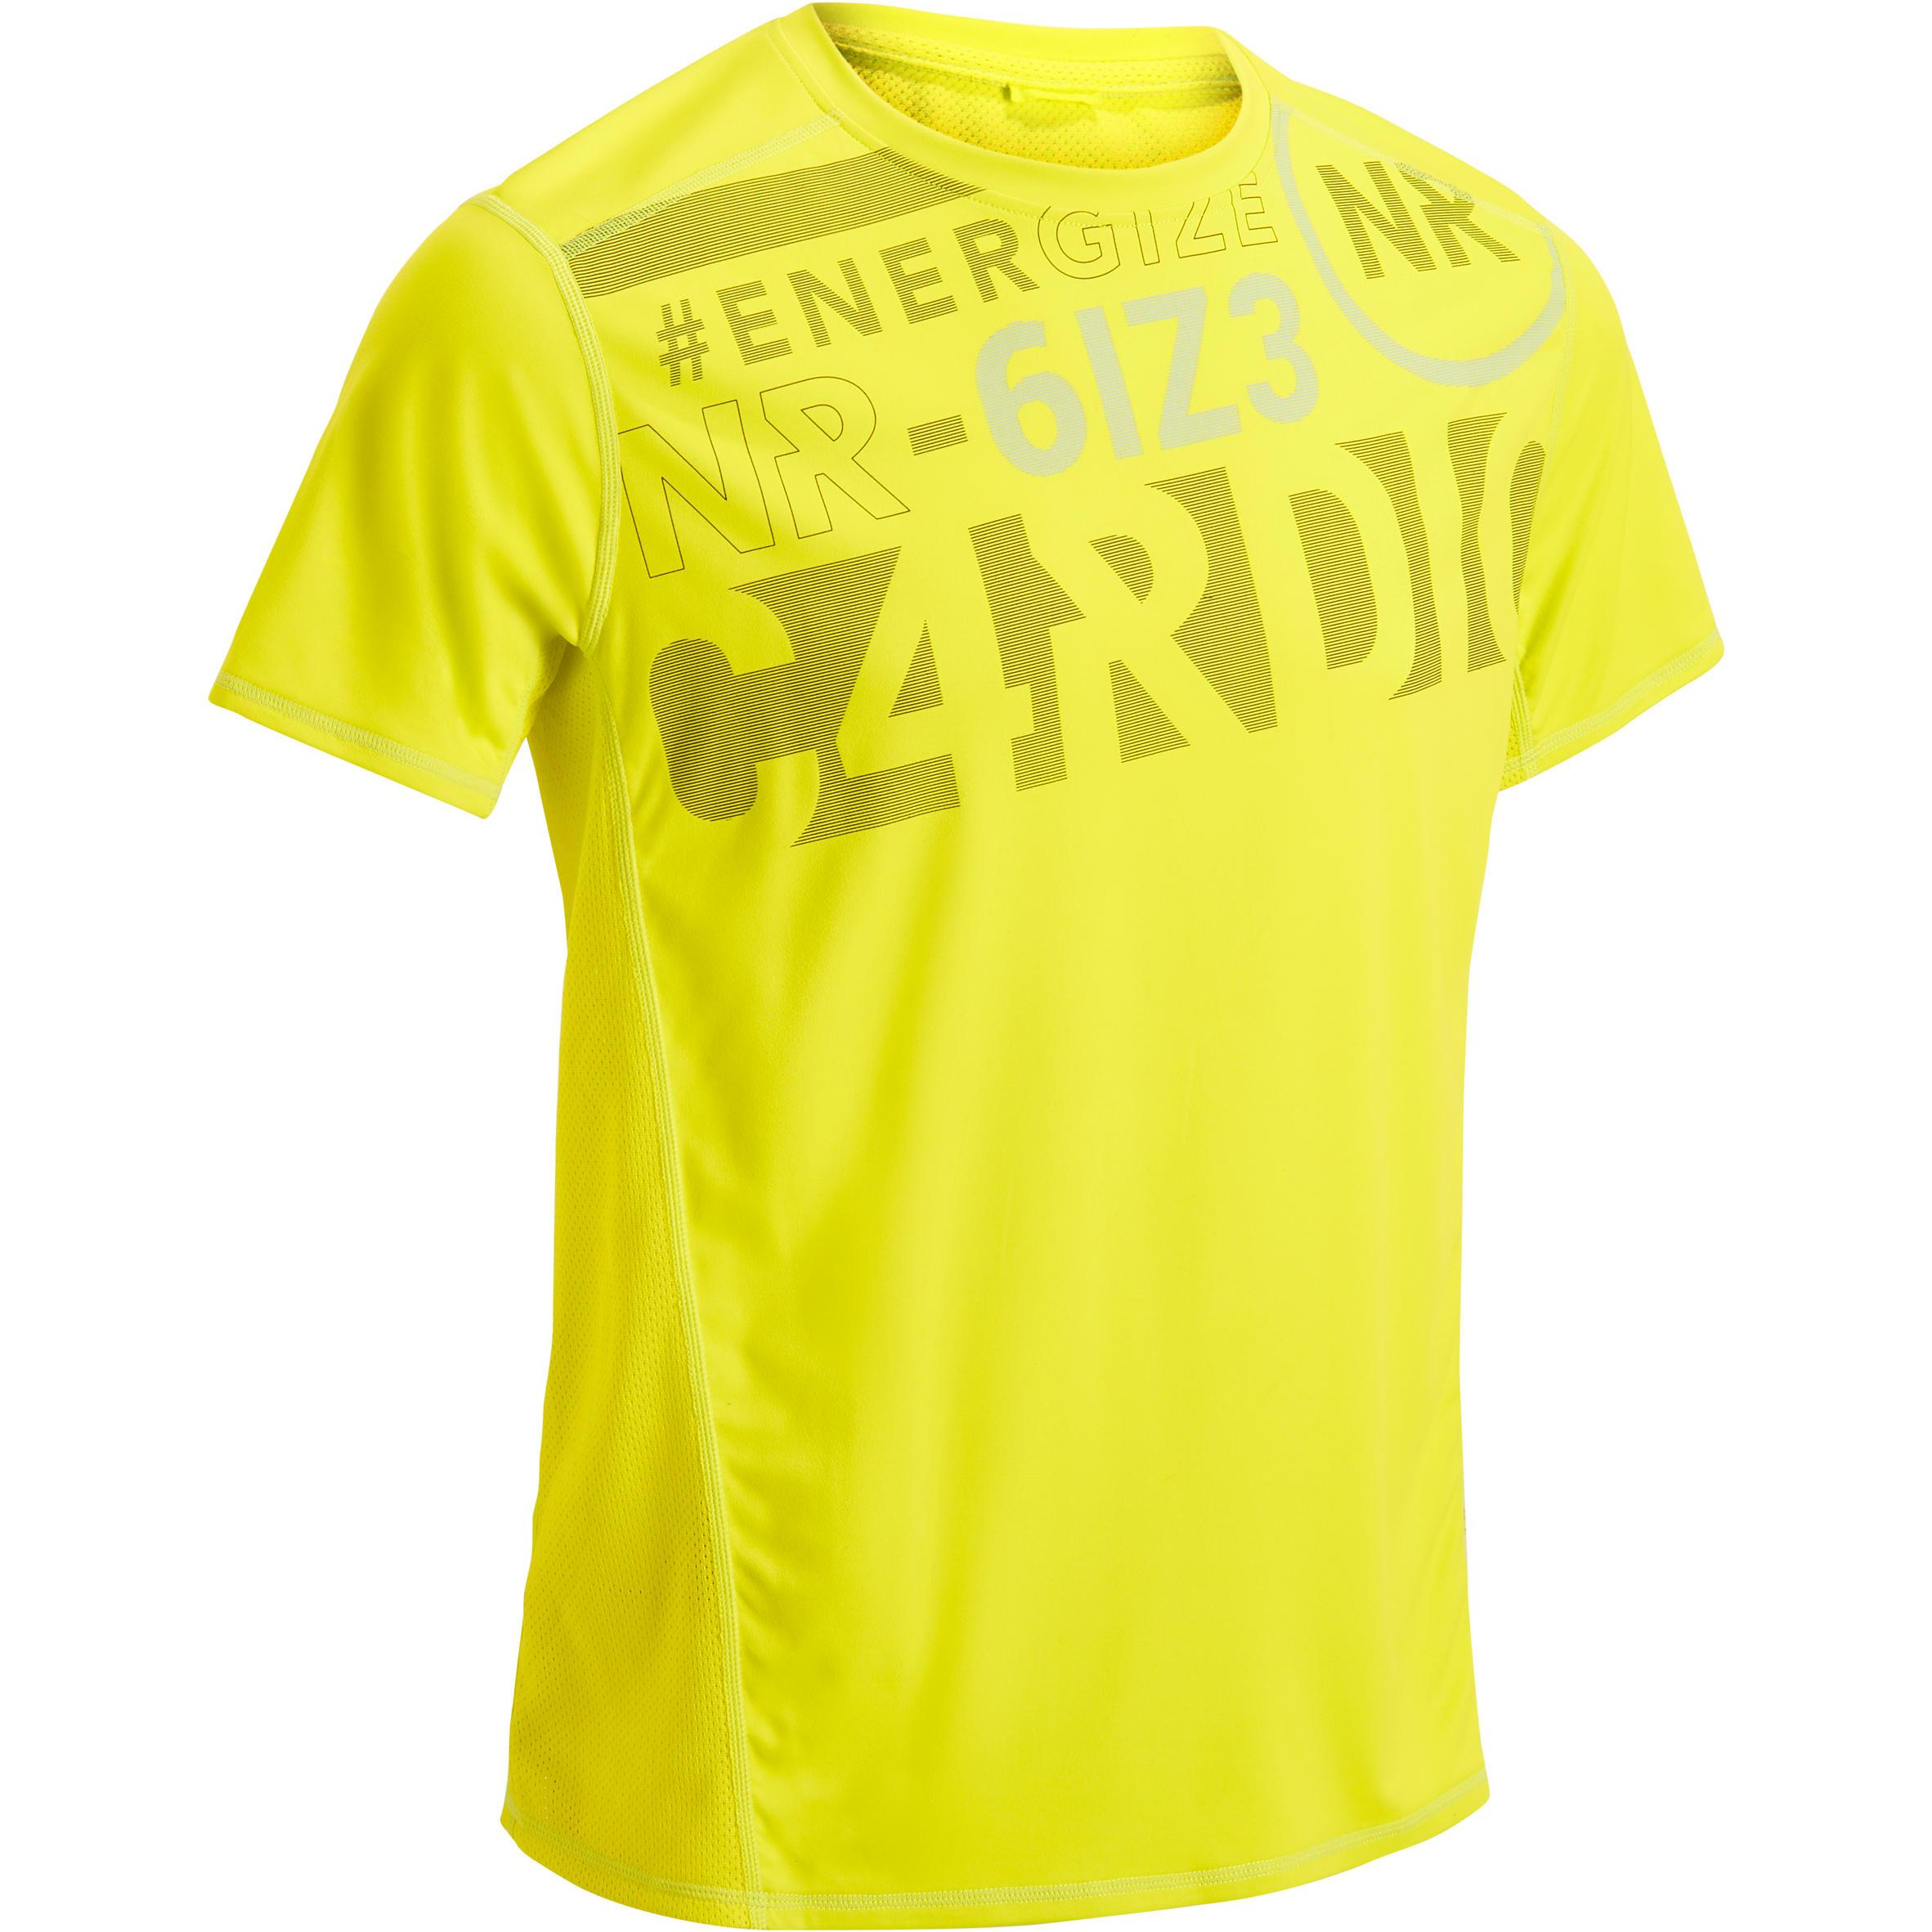 T-shirt Cardio Homme FTS120...